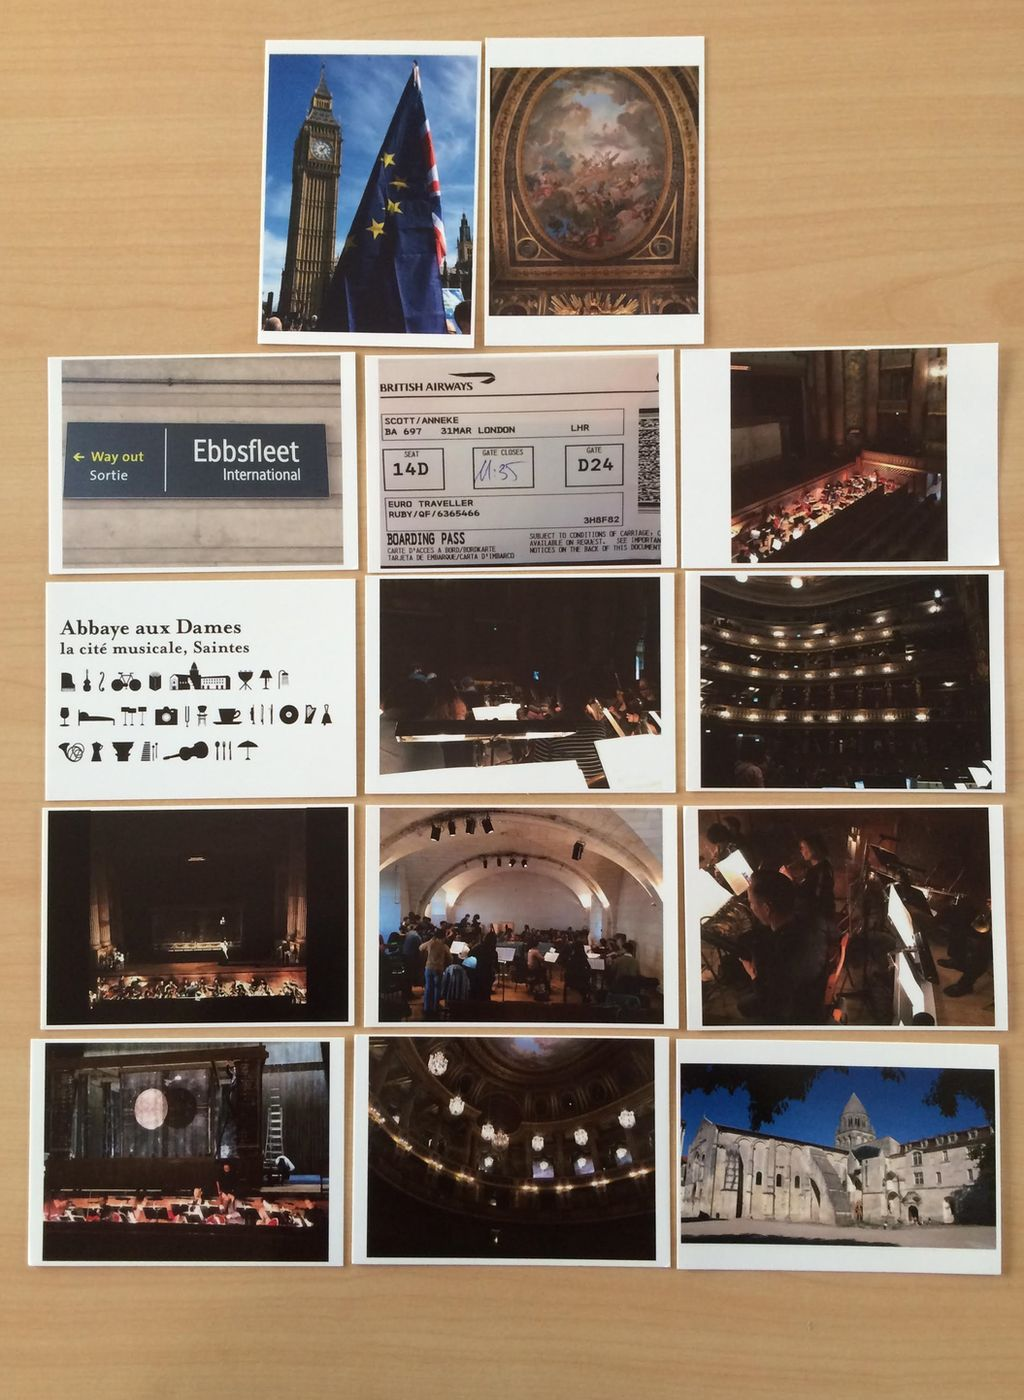 Anneke Scott's postcards